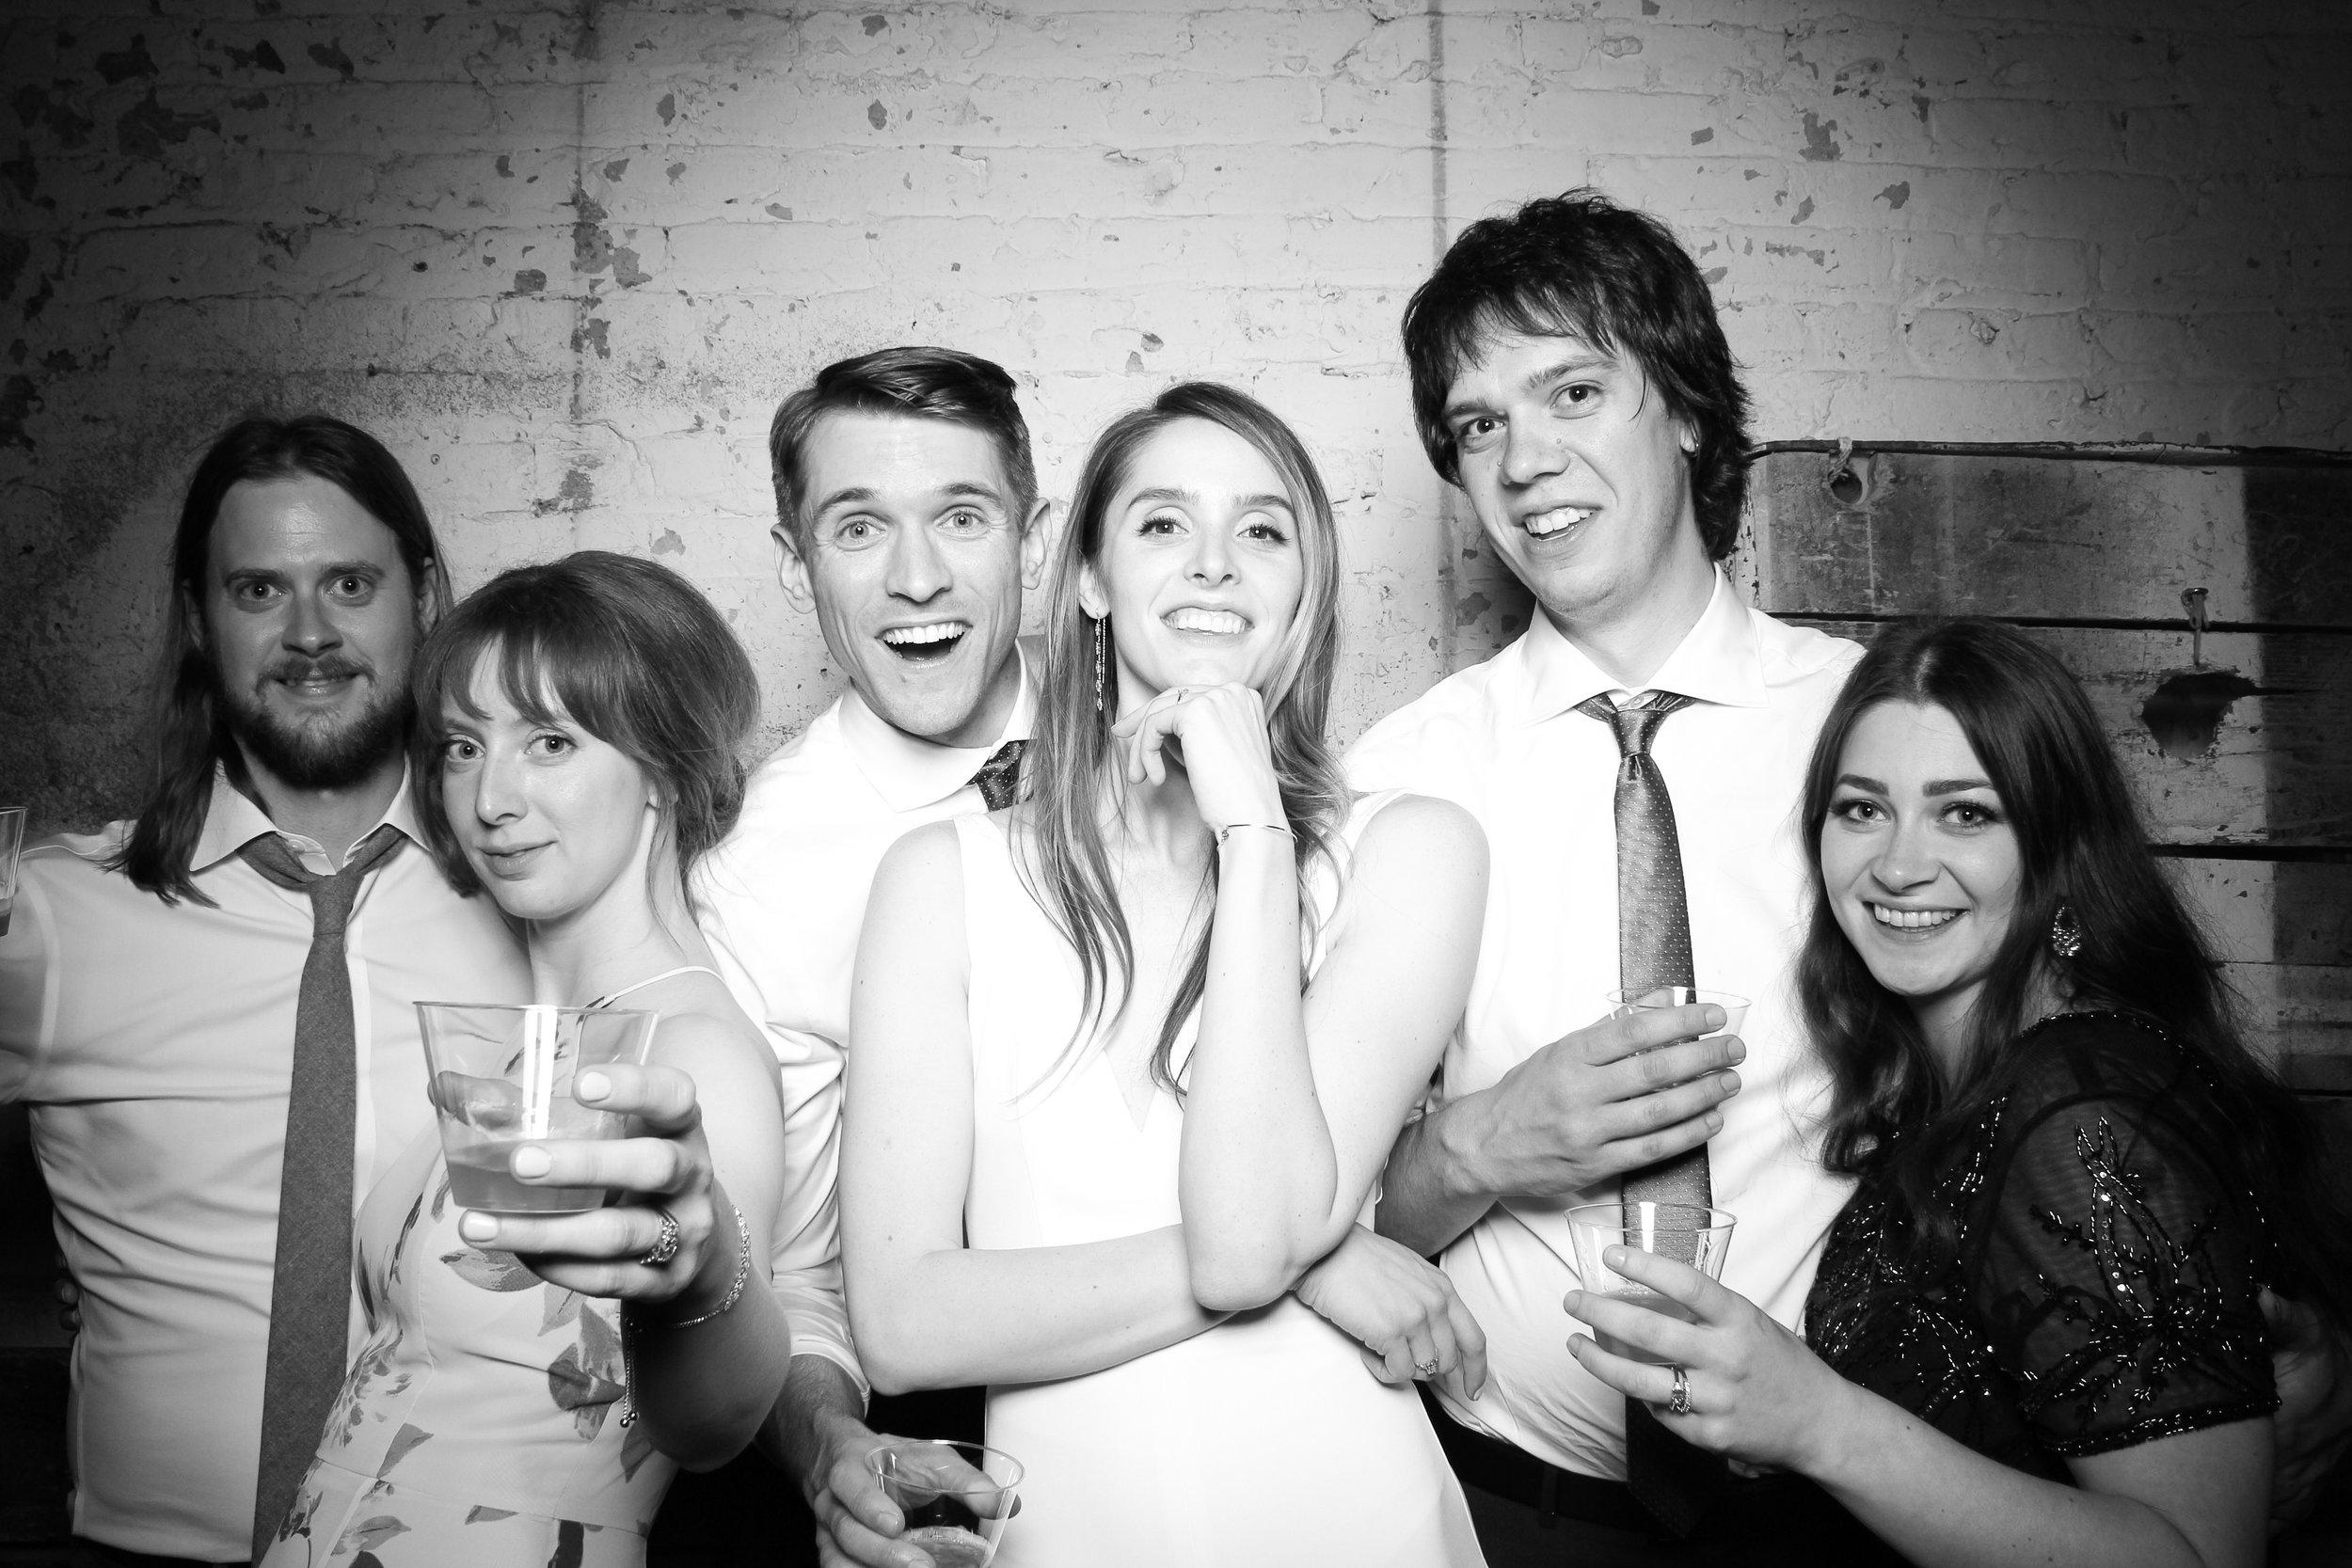 The_Joinery_Wedding_Venue_Logan_Square_Reception_31.jpg